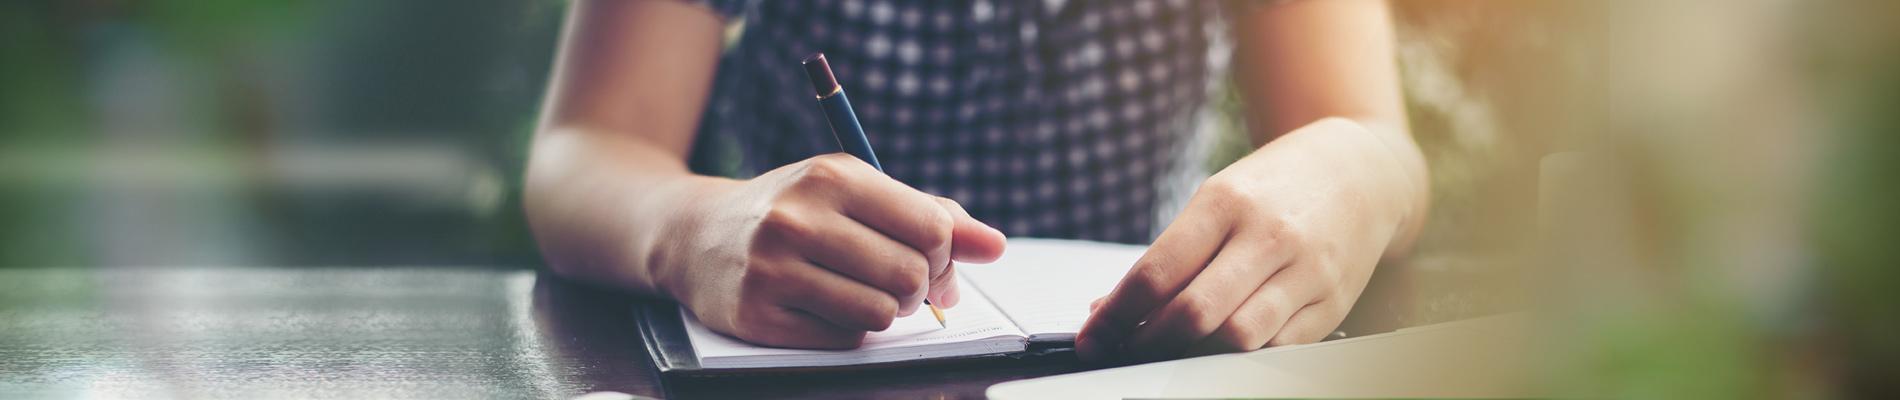 tugba, tugbayönter, yönter, yazı, article, articles, blog, eğitmen, spiker, sunucu